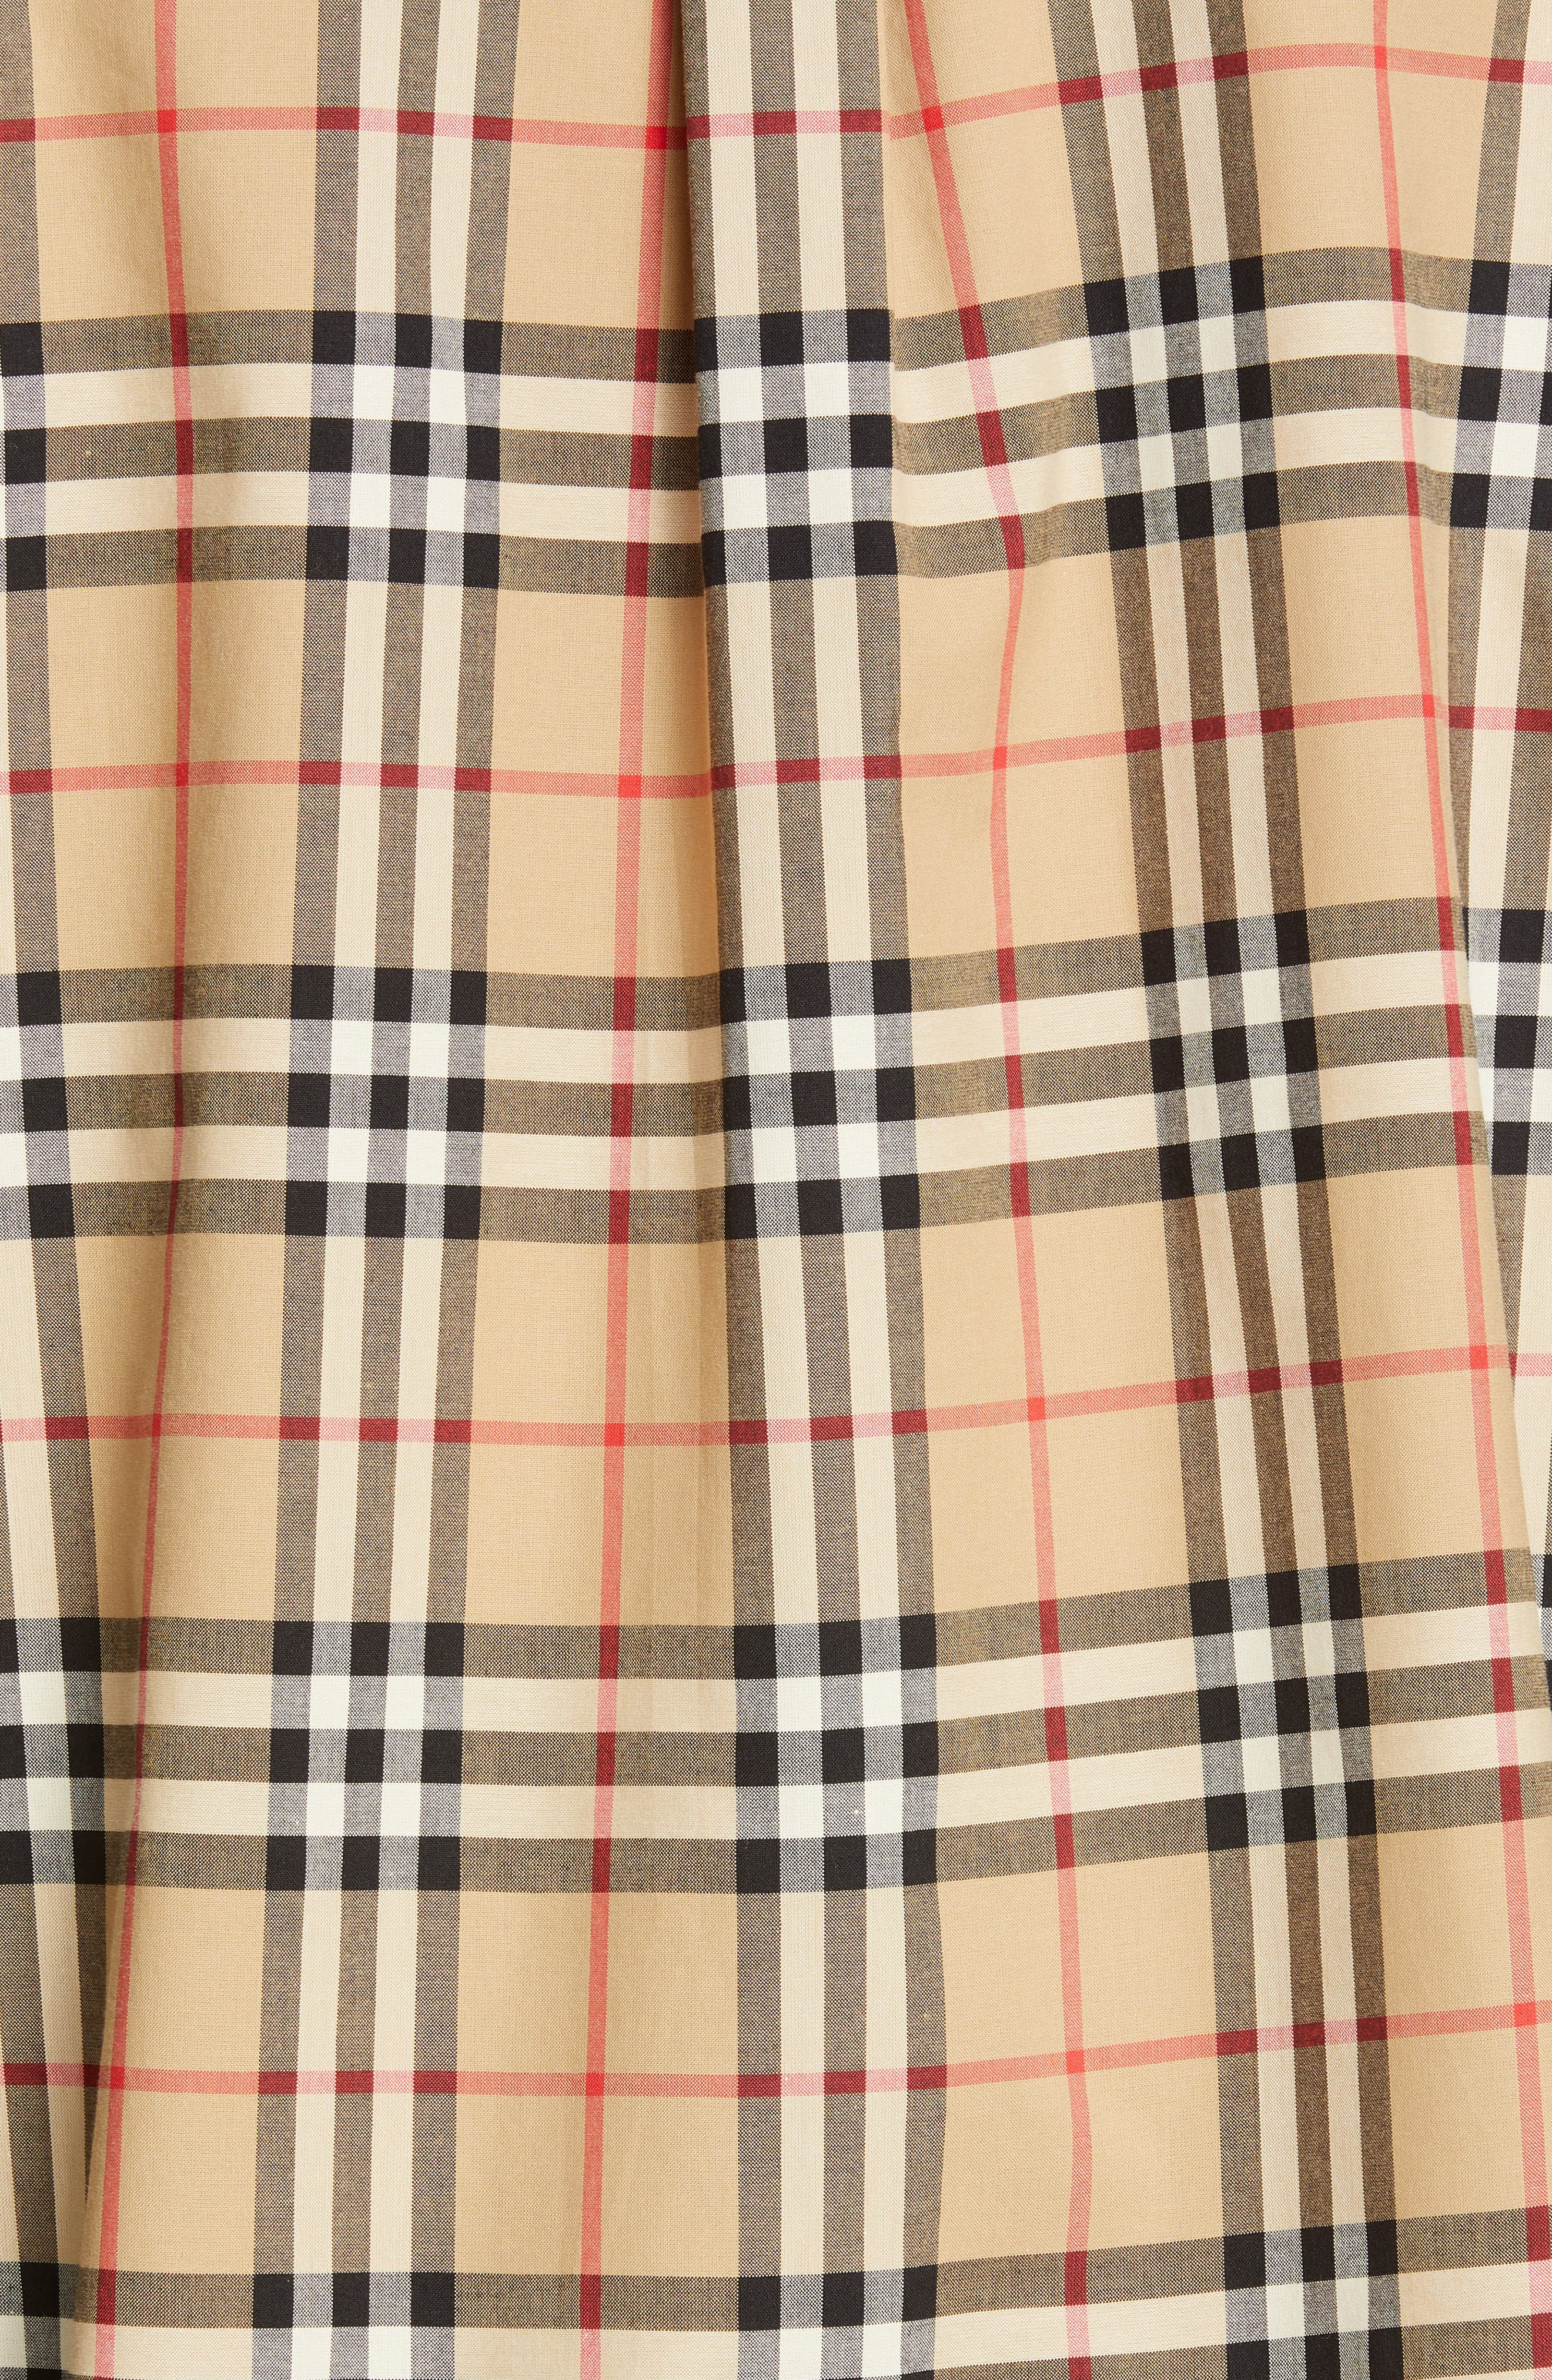 BURBERRY, Turnstone Check Shirt, Alternate thumbnail 5, color, ARCHIVE BEIGE IP CHK